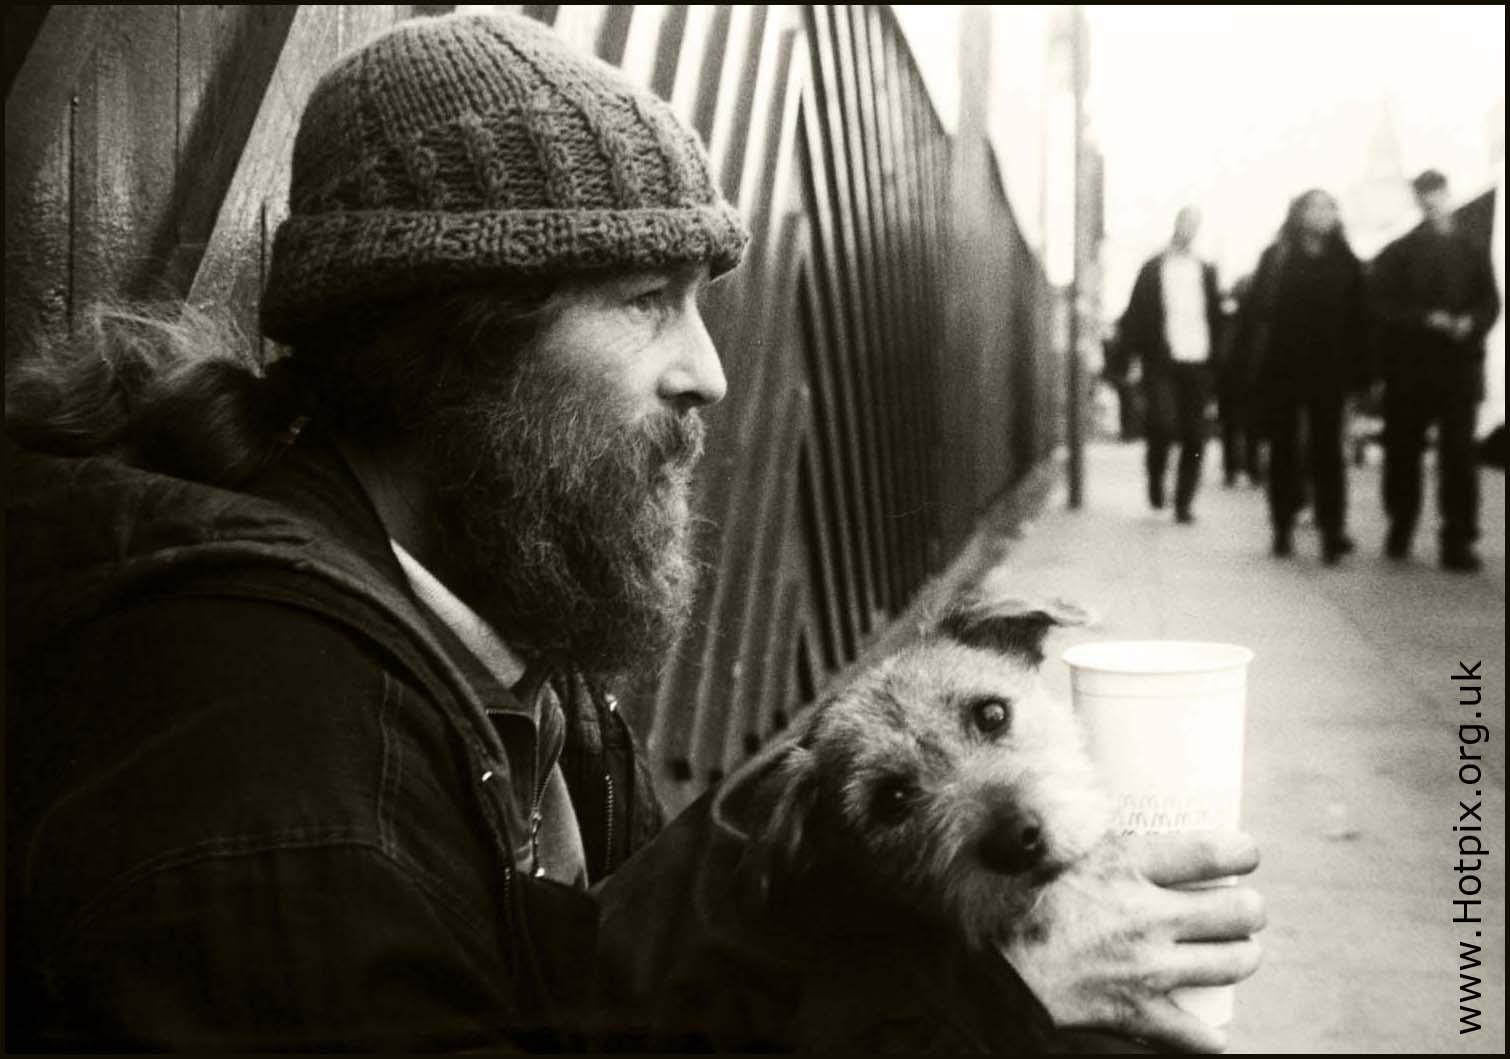 Billy,Suzy,dog,puppy,oxford,rd,road,manchester,winter,November,December,January,February,1995,tex,gary,job,centre,jobless,plus,jobcentre,jobcentreplus,homeless,home,less,homelessness,street,on the street,north,west,england,uk,GB,black,white,BW,Monochrome,TMax,400,TMAX400,TonySmith,Tony,smith,ACIH,LRPS,ActiveH,Housing,System,HMS,MIS,MIS-AMS,nightshelter,director,managing,CIH,Chartered,Institute,mono,city,dark,disturbia,hotpicks,hotpix!,man,begger,beg,begging,vagrant,vagabond,hotpix.rocketmail.com,hotpixuk.rocketmail.com,contact.tony.smith.gmail.com,tony.smith.gmail.com,tonys@miscs.com,tony.smith@mis-ams.com